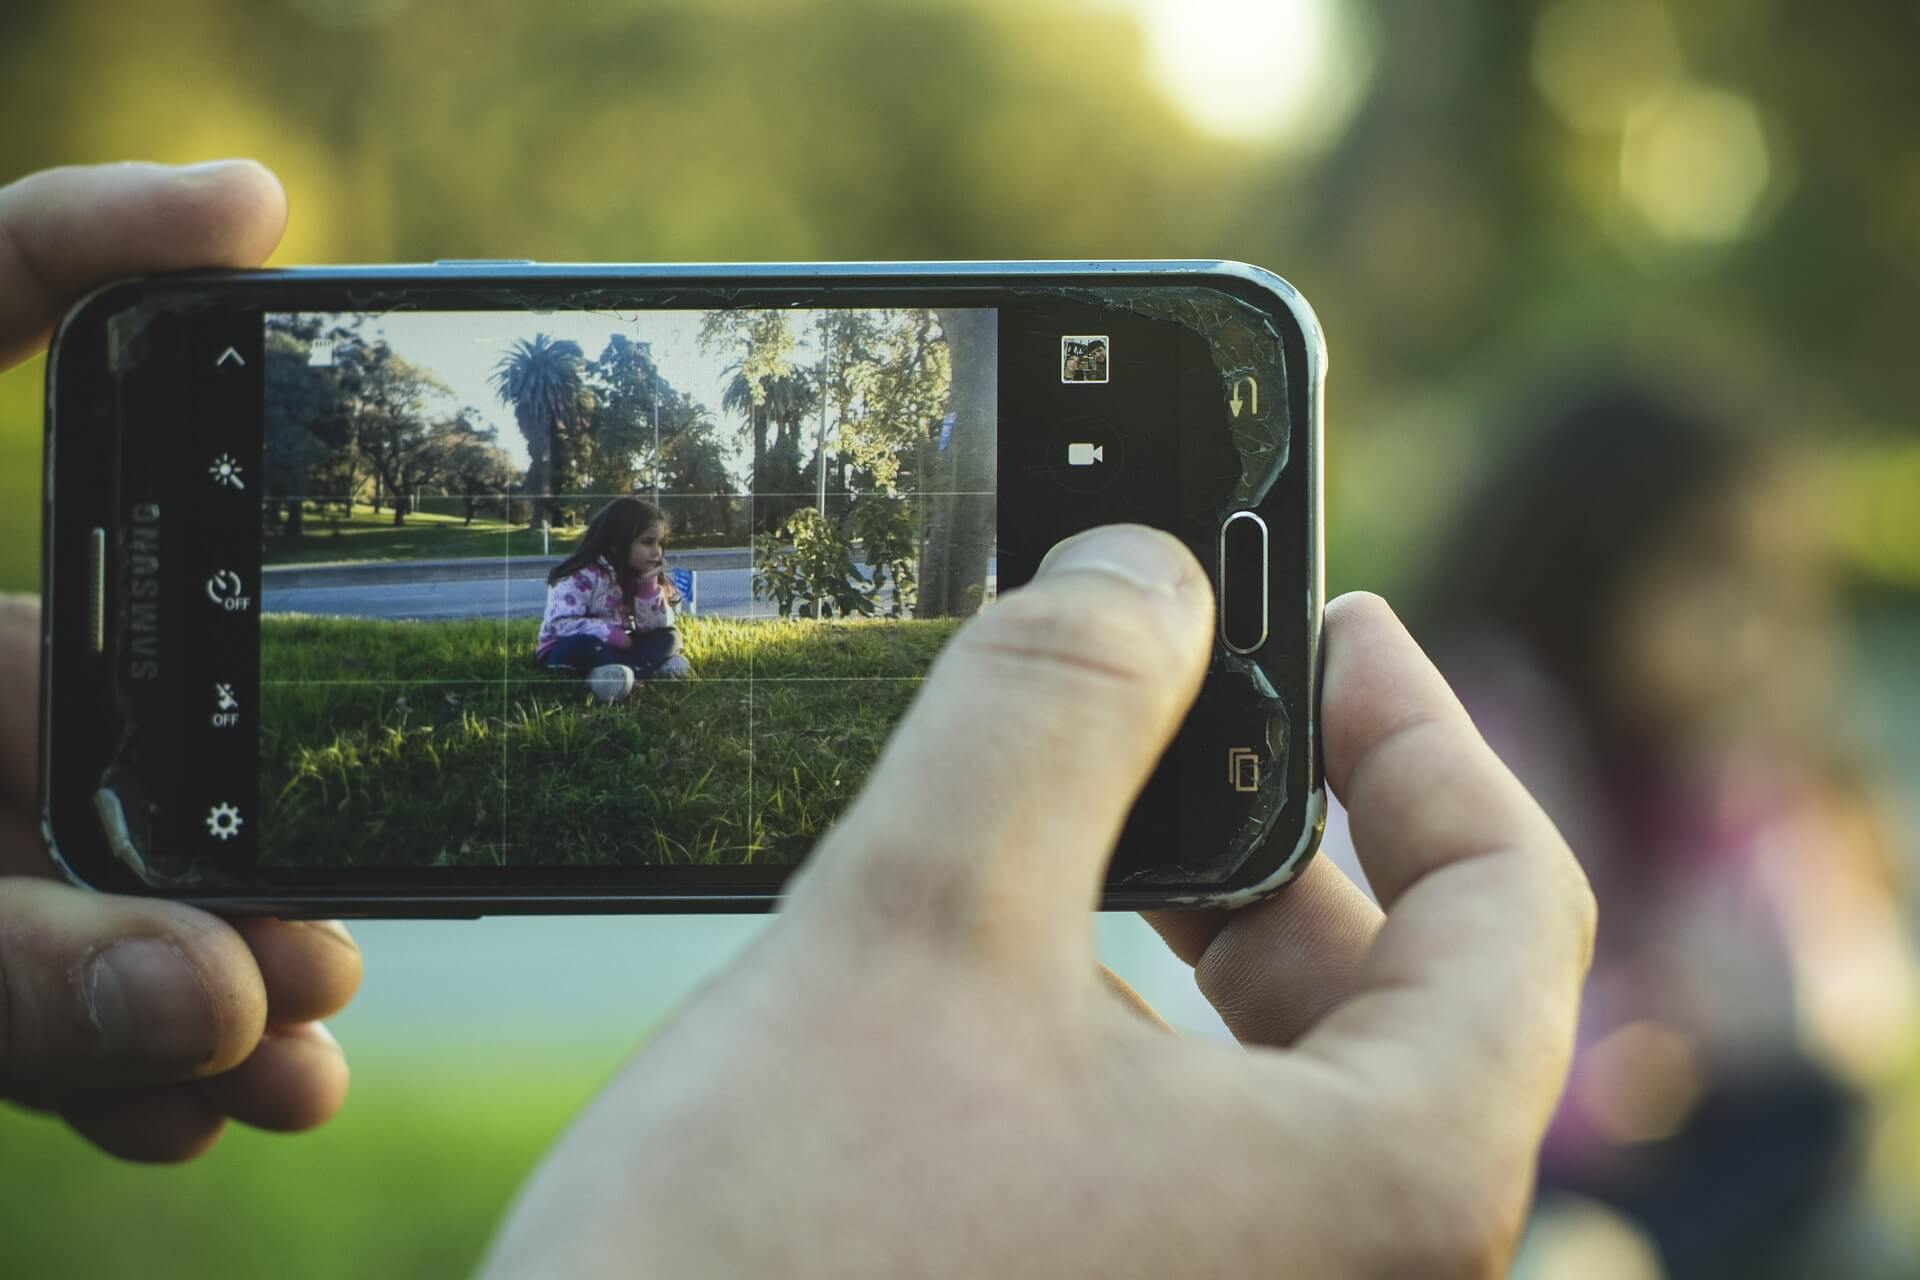 content/de-de/images/repository/isc/2020/is-it-safe-to-post-photos-of-your-kids-online.jpg